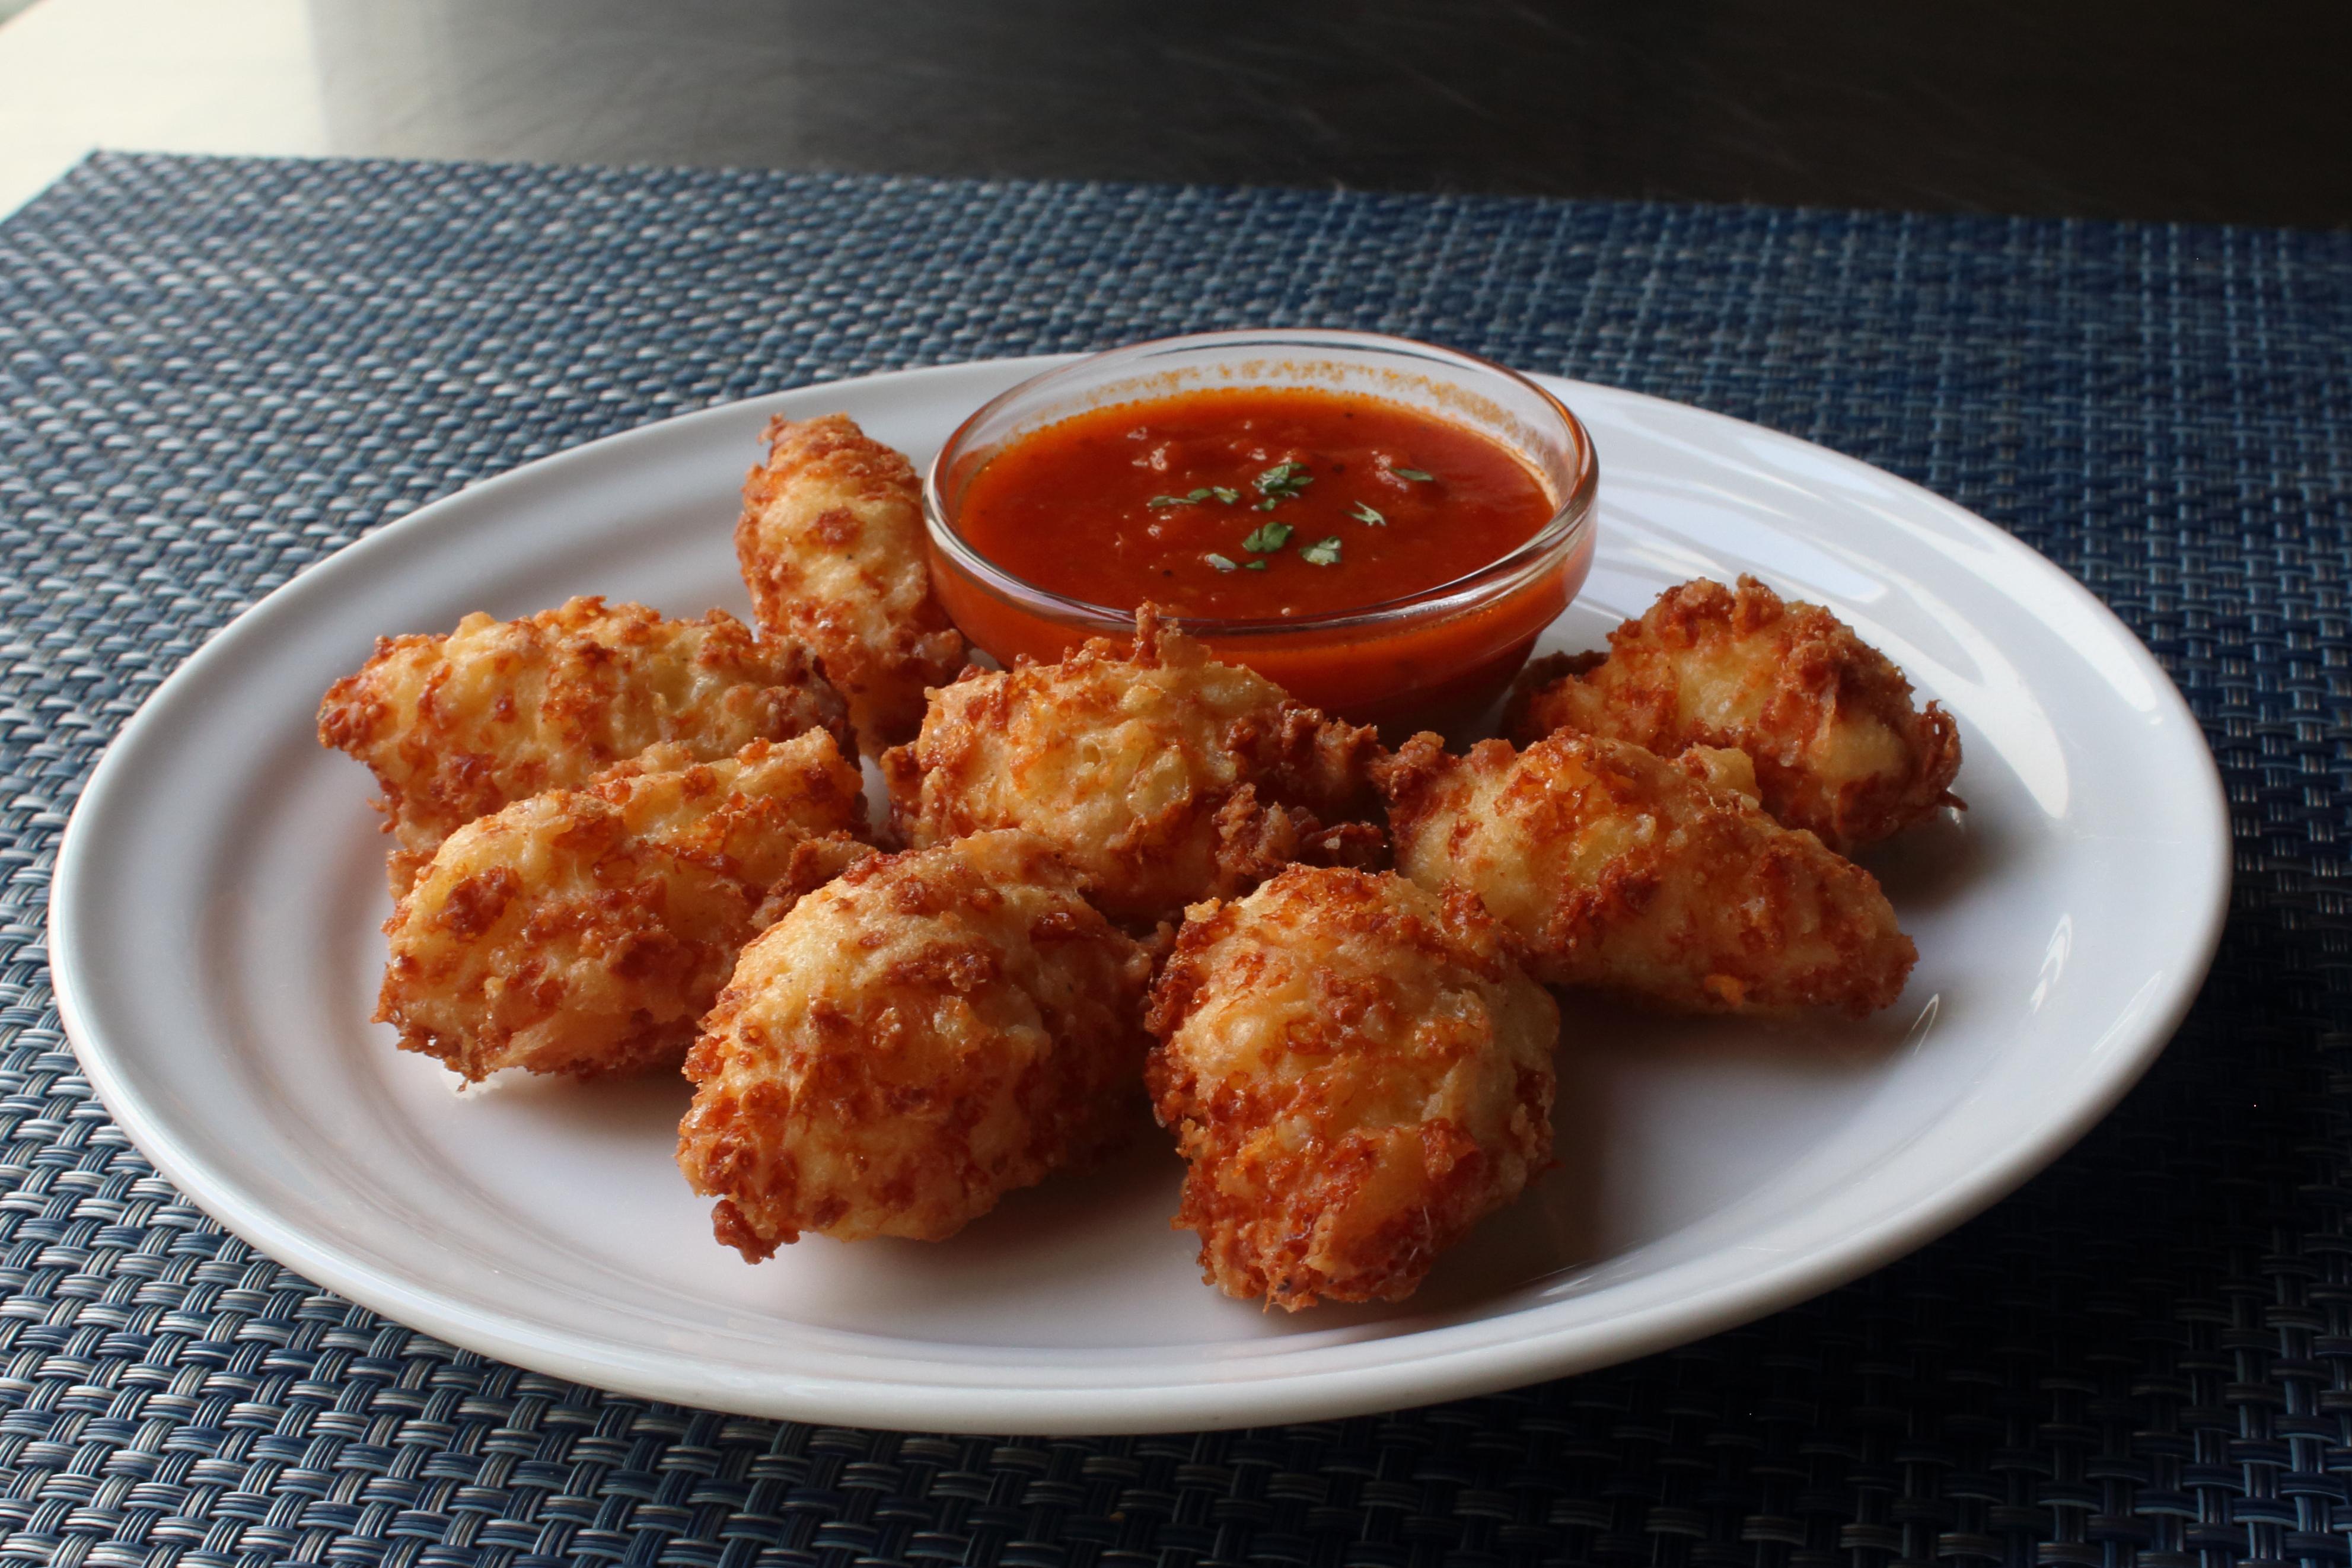 Fried Mozzarella Puffs